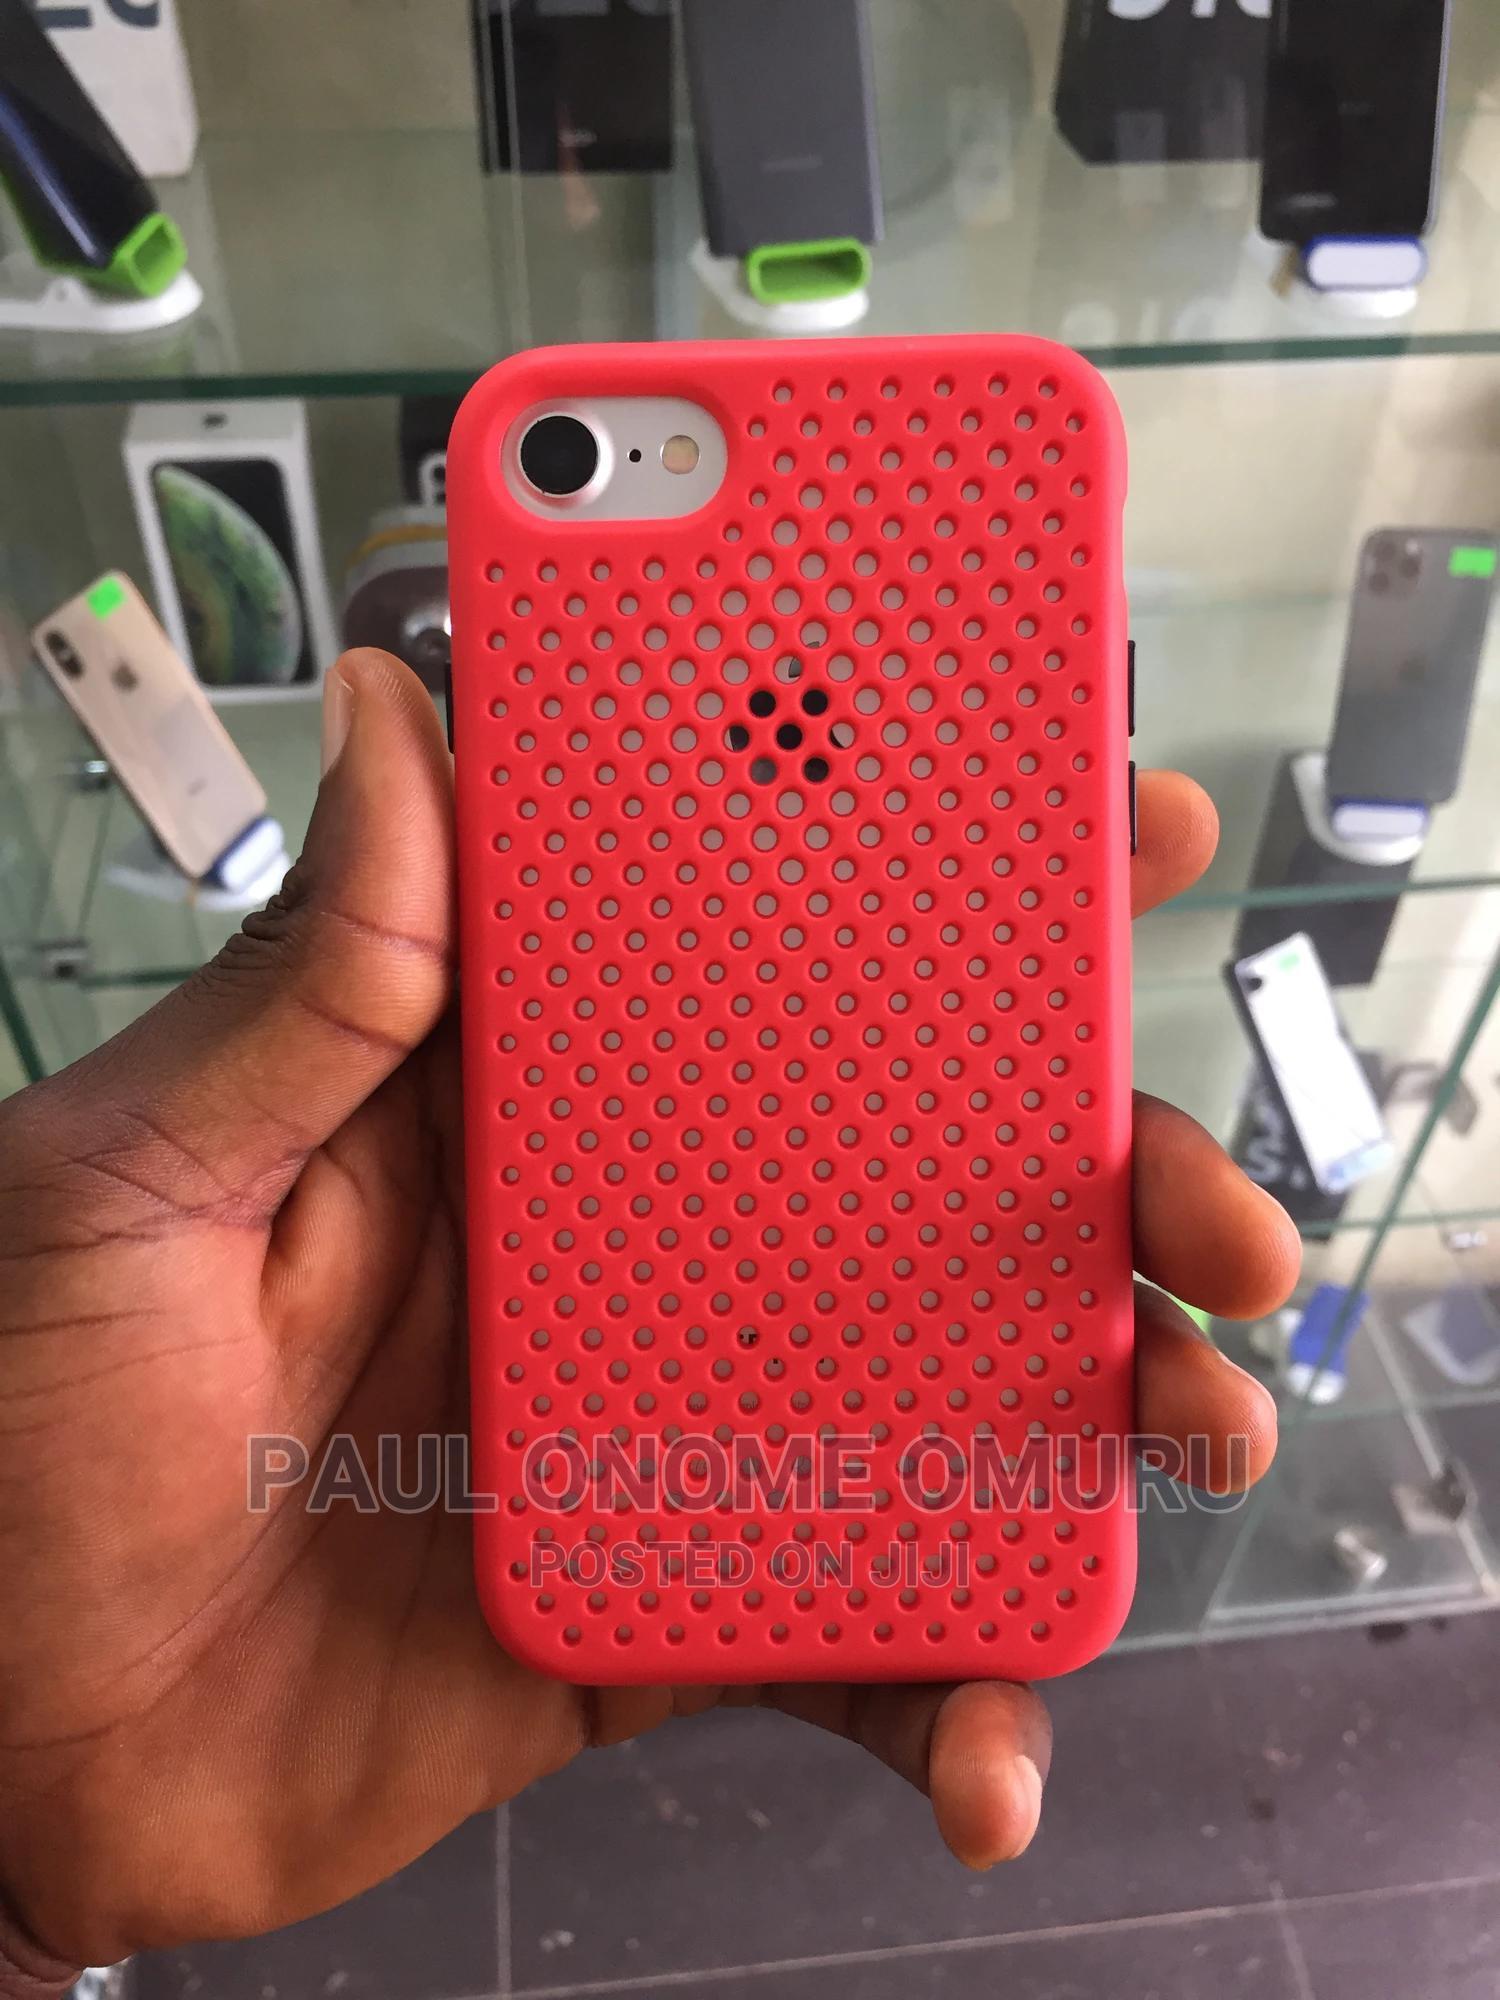 Apple iPhone 7 128 GB Silver   Mobile Phones for sale in Ikorodu, Lagos State, Nigeria